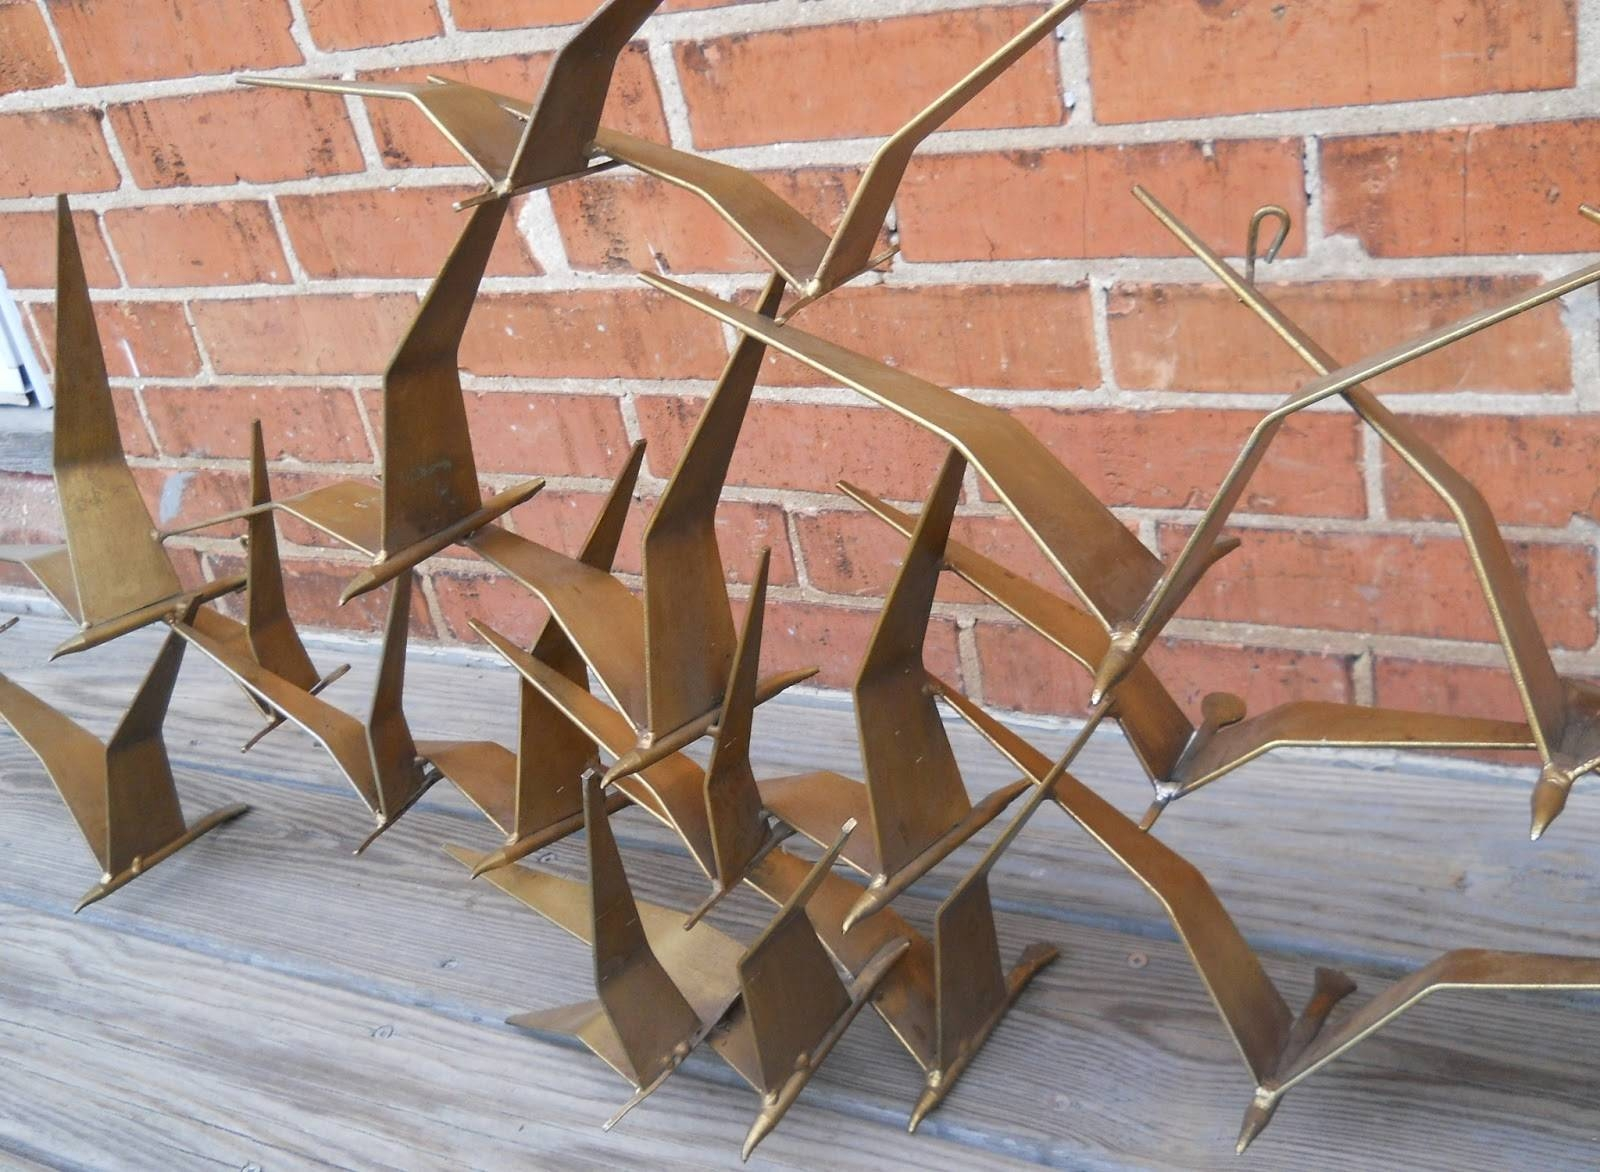 Lauragarnet: Huge Curtis Jere Flock Of Birds Seagulls Sculpture 58 With Regard To 2018 Flock Of Birds Metal Wall Art (View 12 of 30)